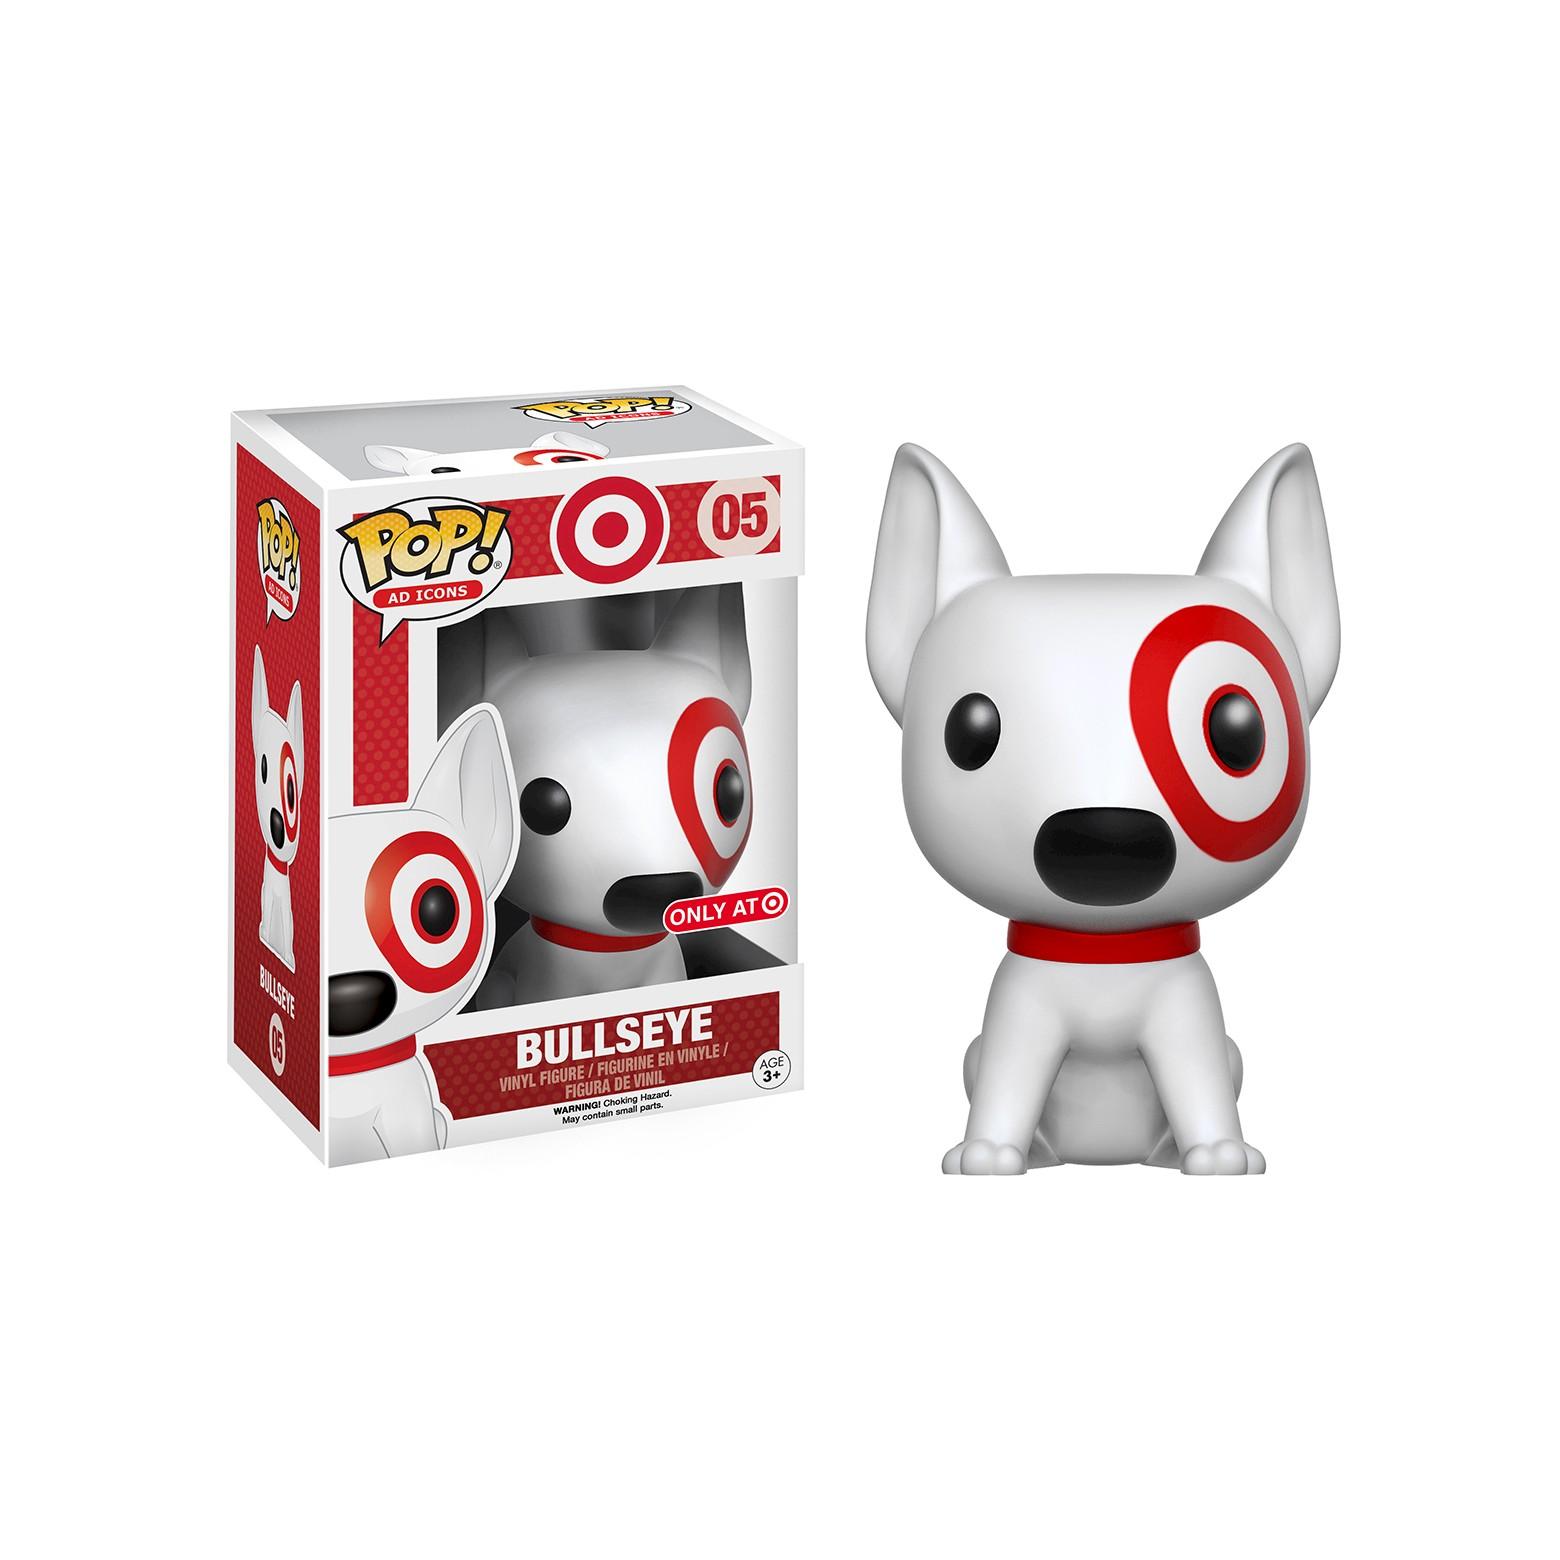 Mr Bill Dog Toy Target